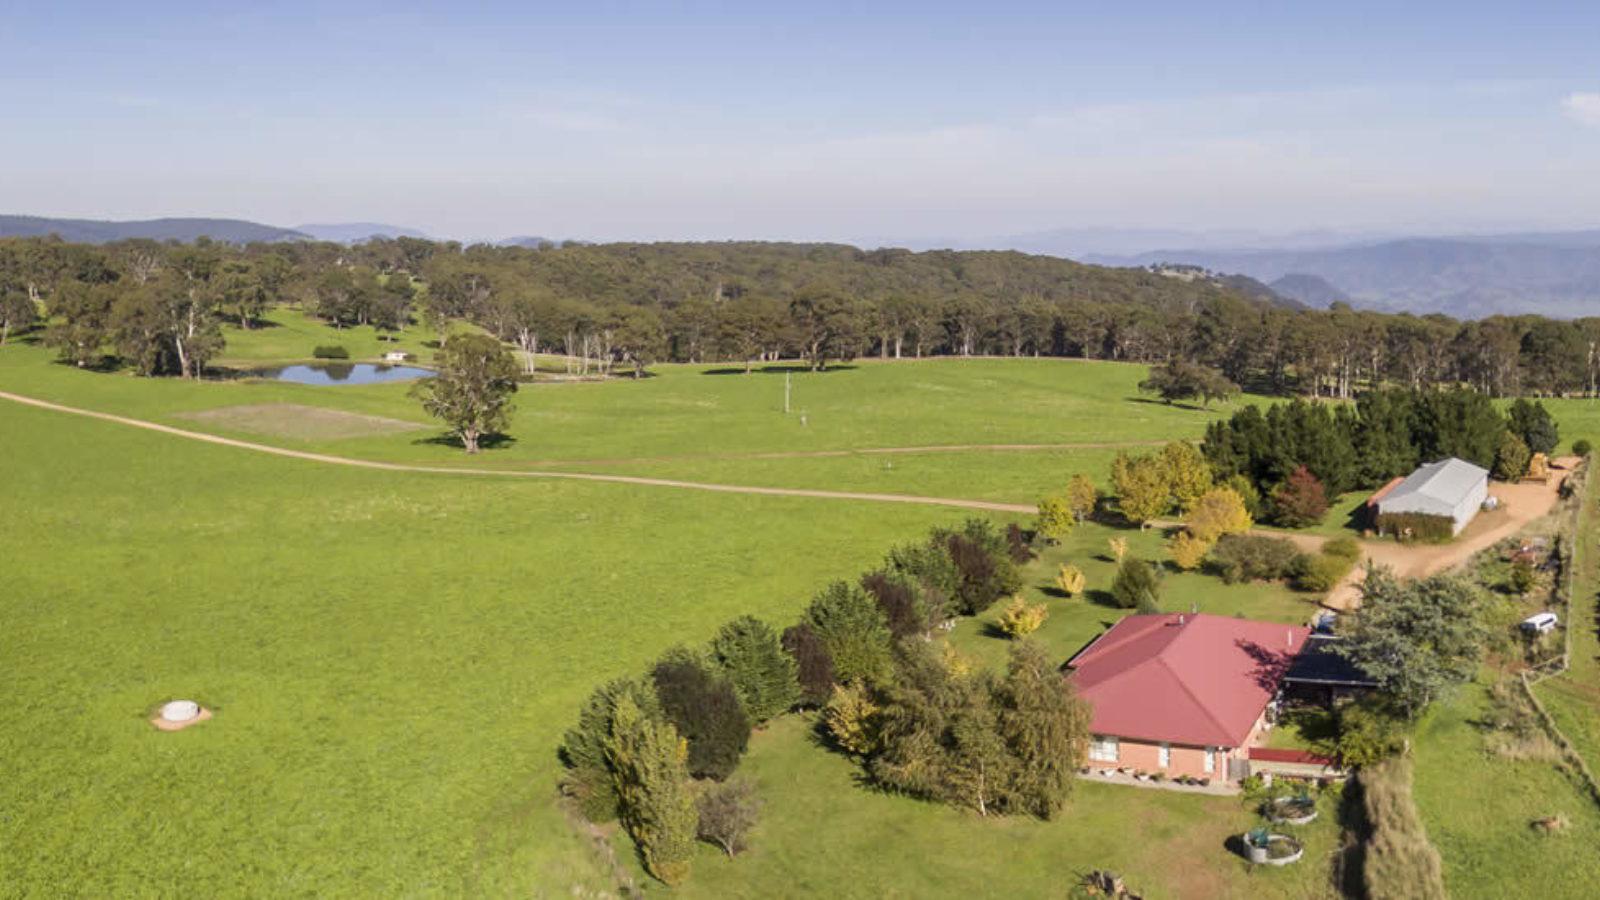 Aussie Ark in Barrington Tops